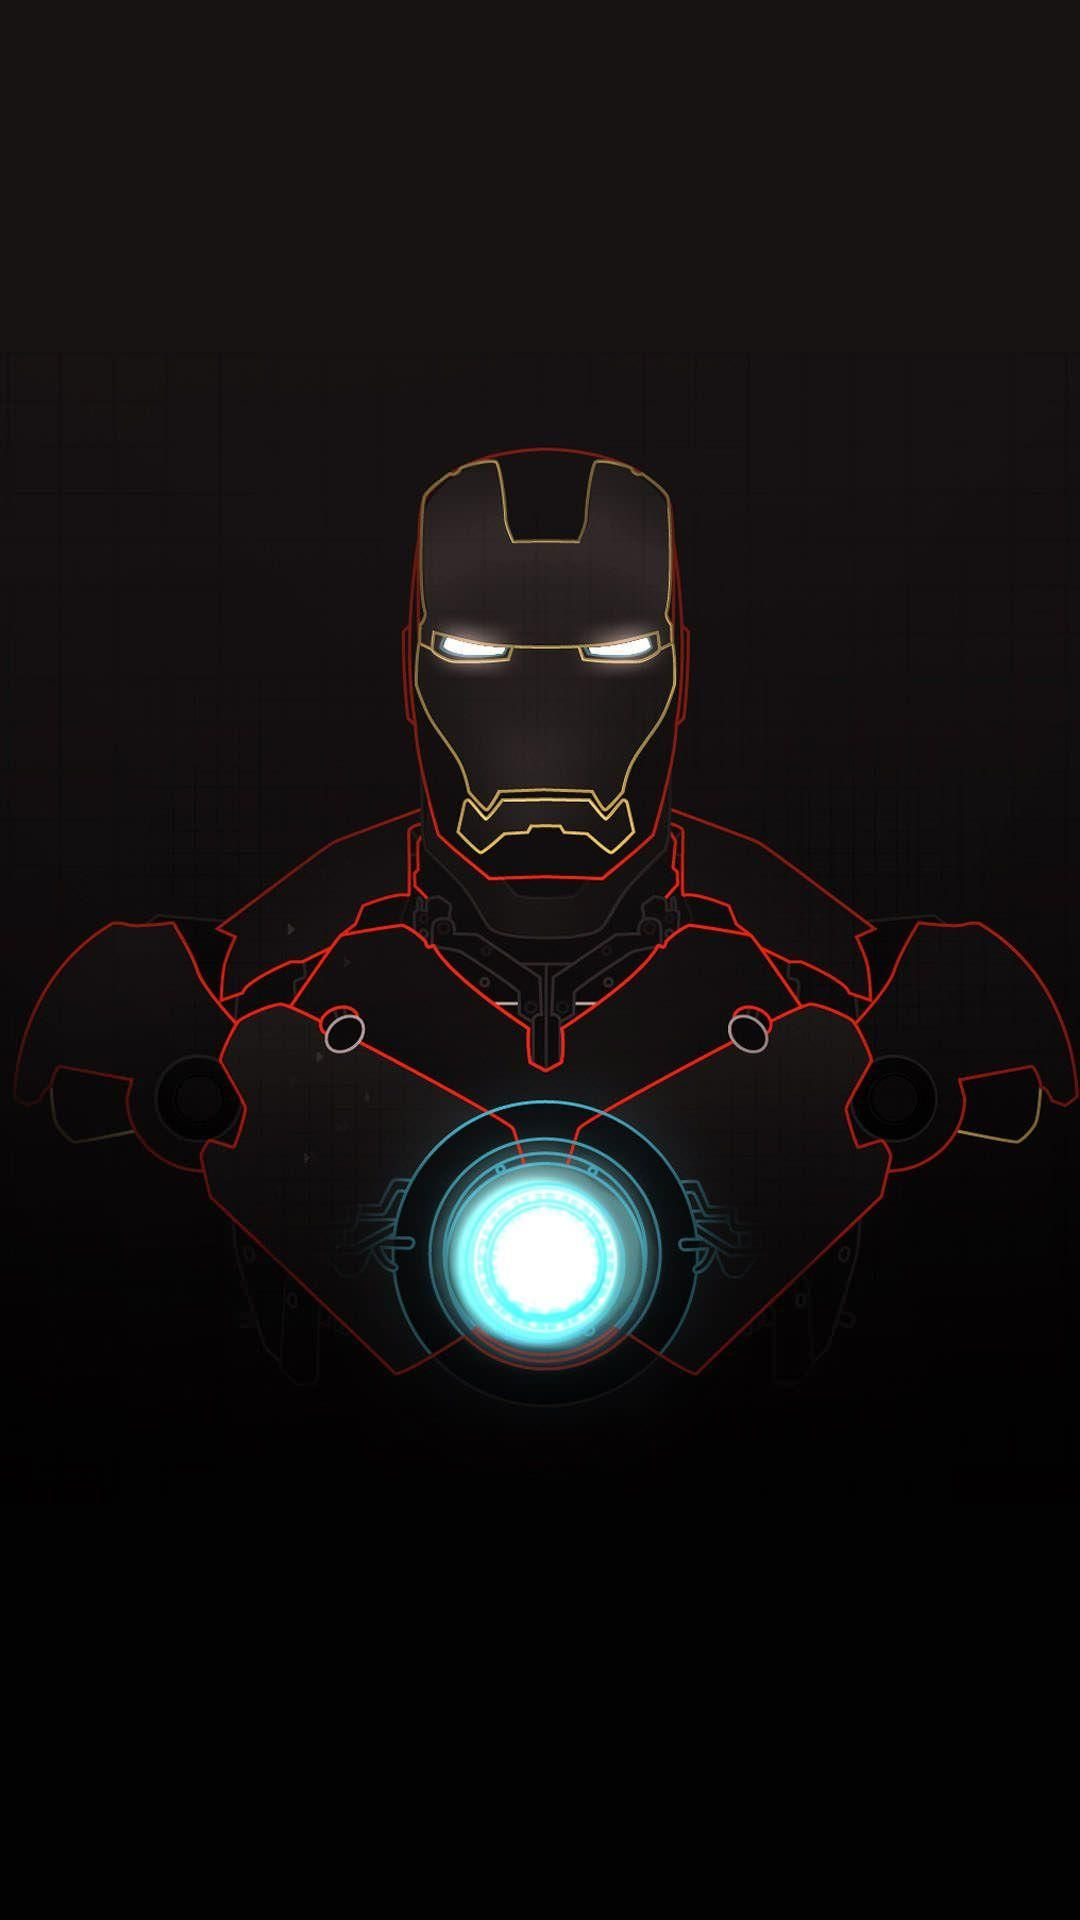 Pin By Decoplan On Movie Iron Man Wallpaper Live Wallpaper Iphone Iron Man Wallpaper Hd